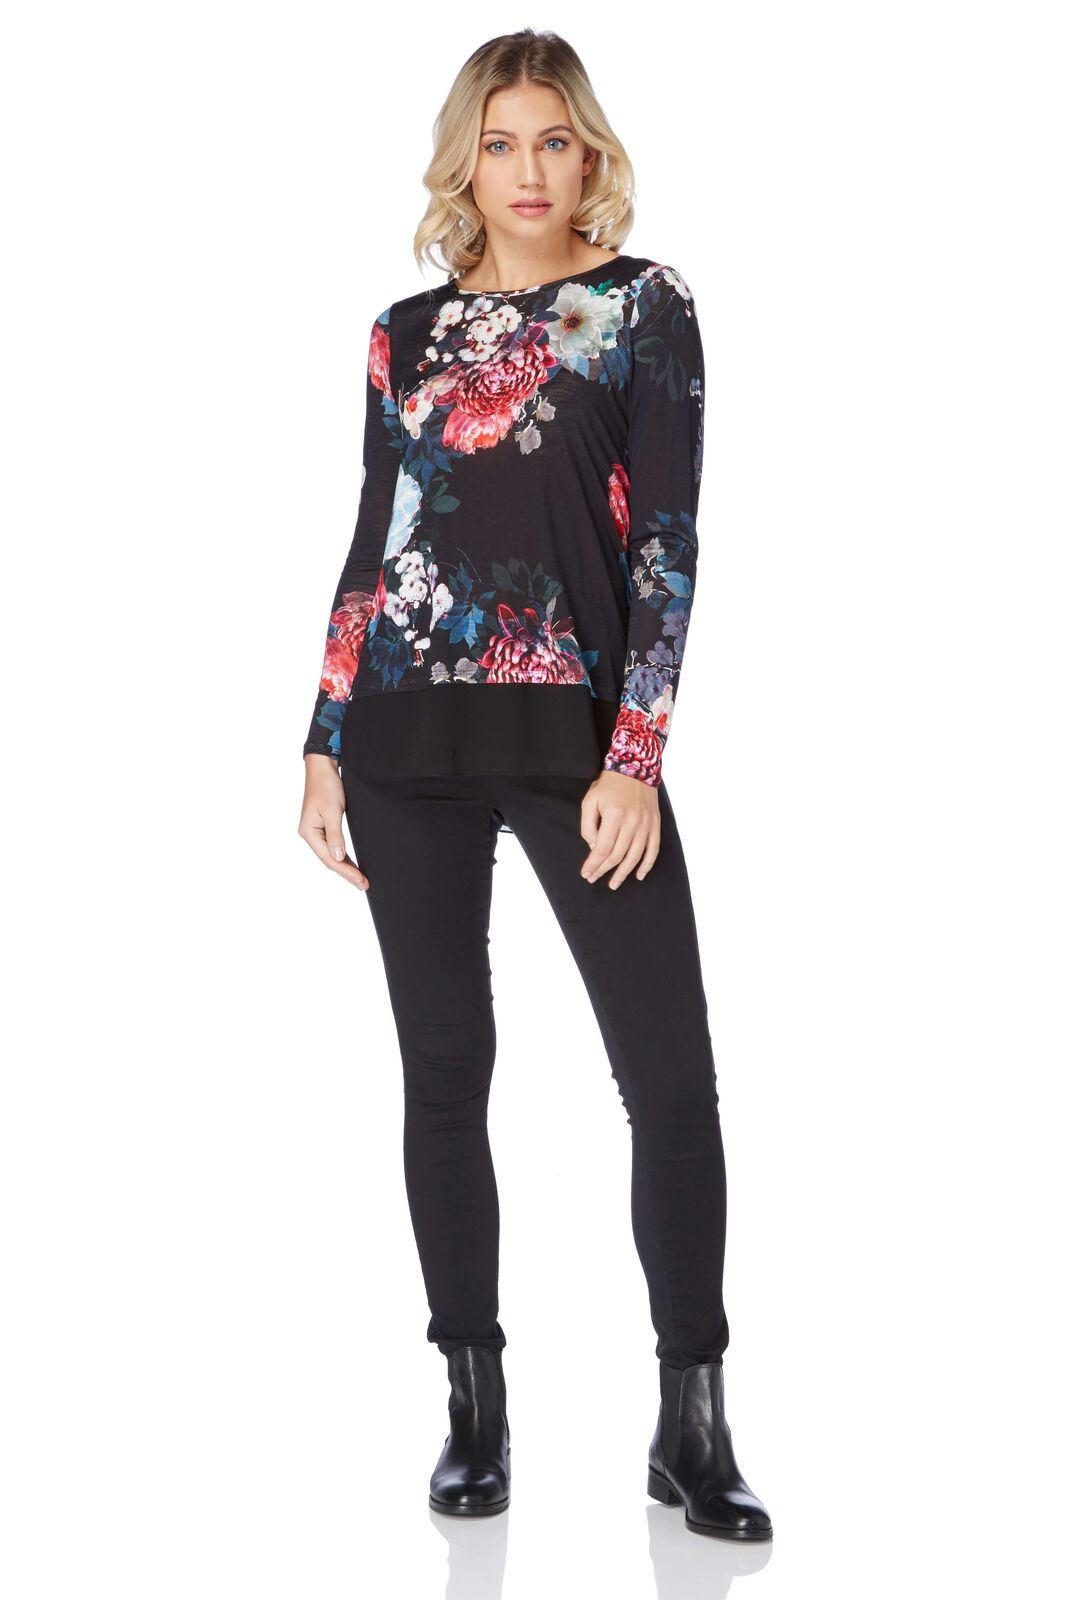 ROMAN-ORIGINALS-Black-Floral-Jersey-Top-with-Chiffon-Mock-Layer-RRP-30 thumbnail 5